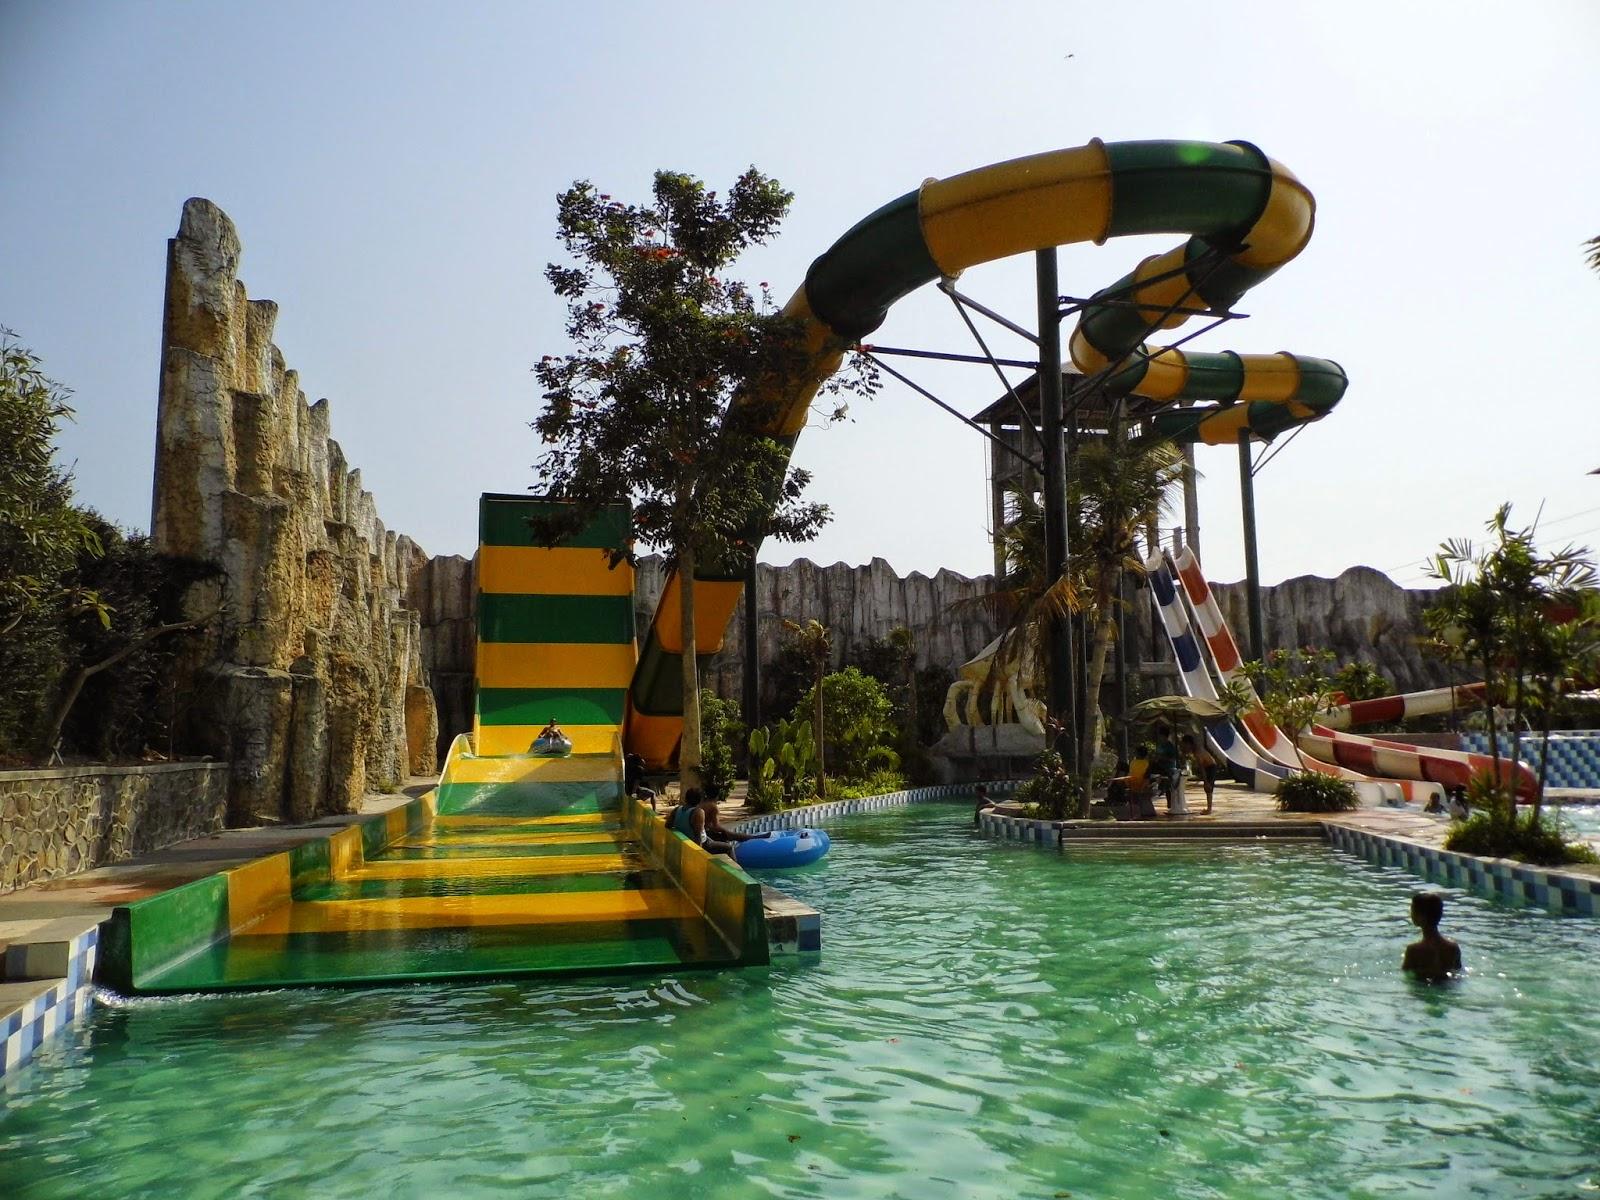 Wisata Terbaru Kediri Gumul Paradise Island Makde Udin Kab